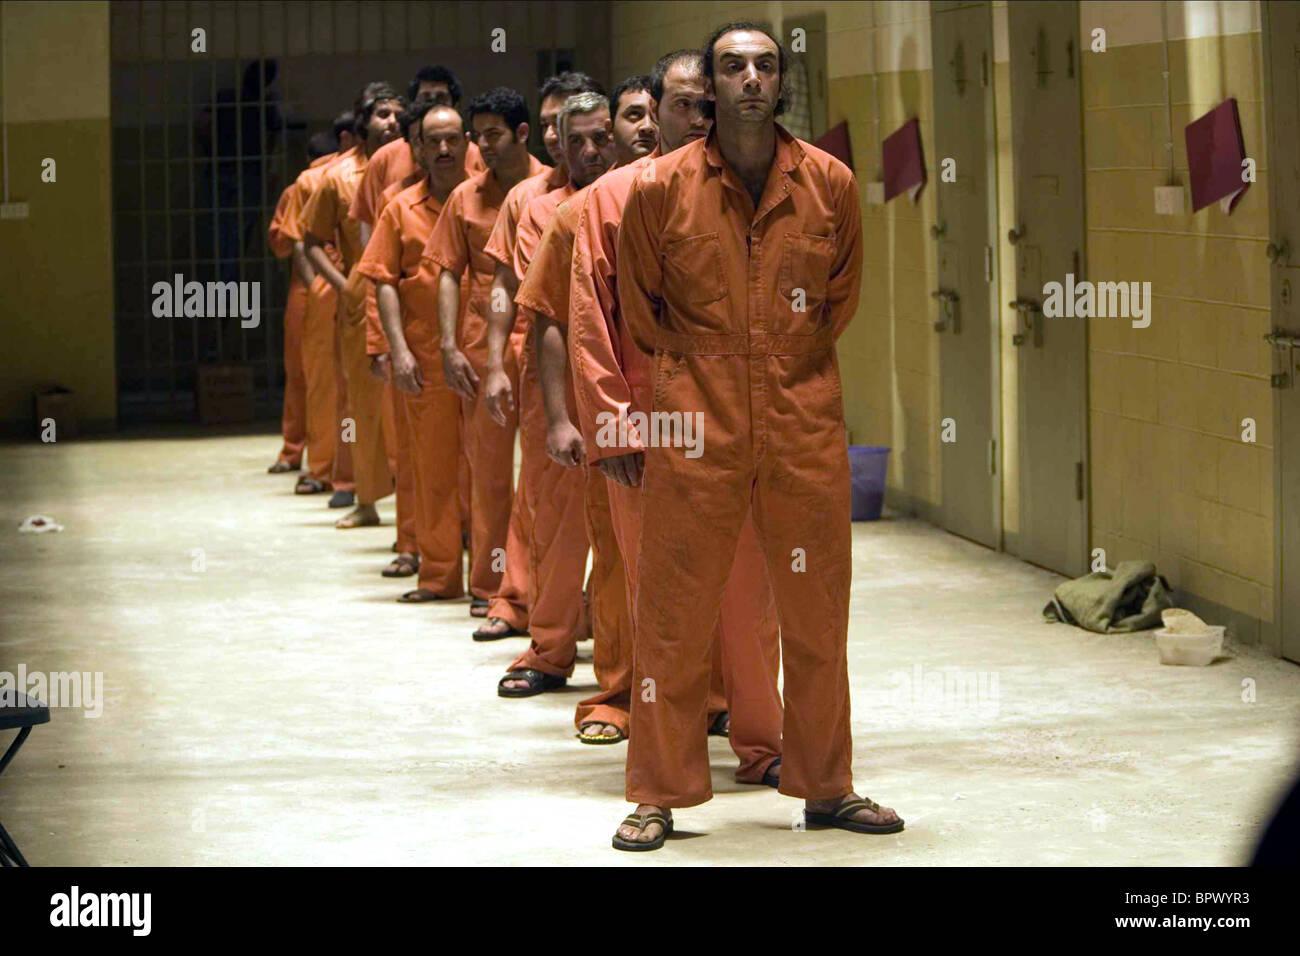 ABU GHRAIB IRAQI PRISON INMATES STANDARD OPERATING PROCEDURE (2008) - Stock Image